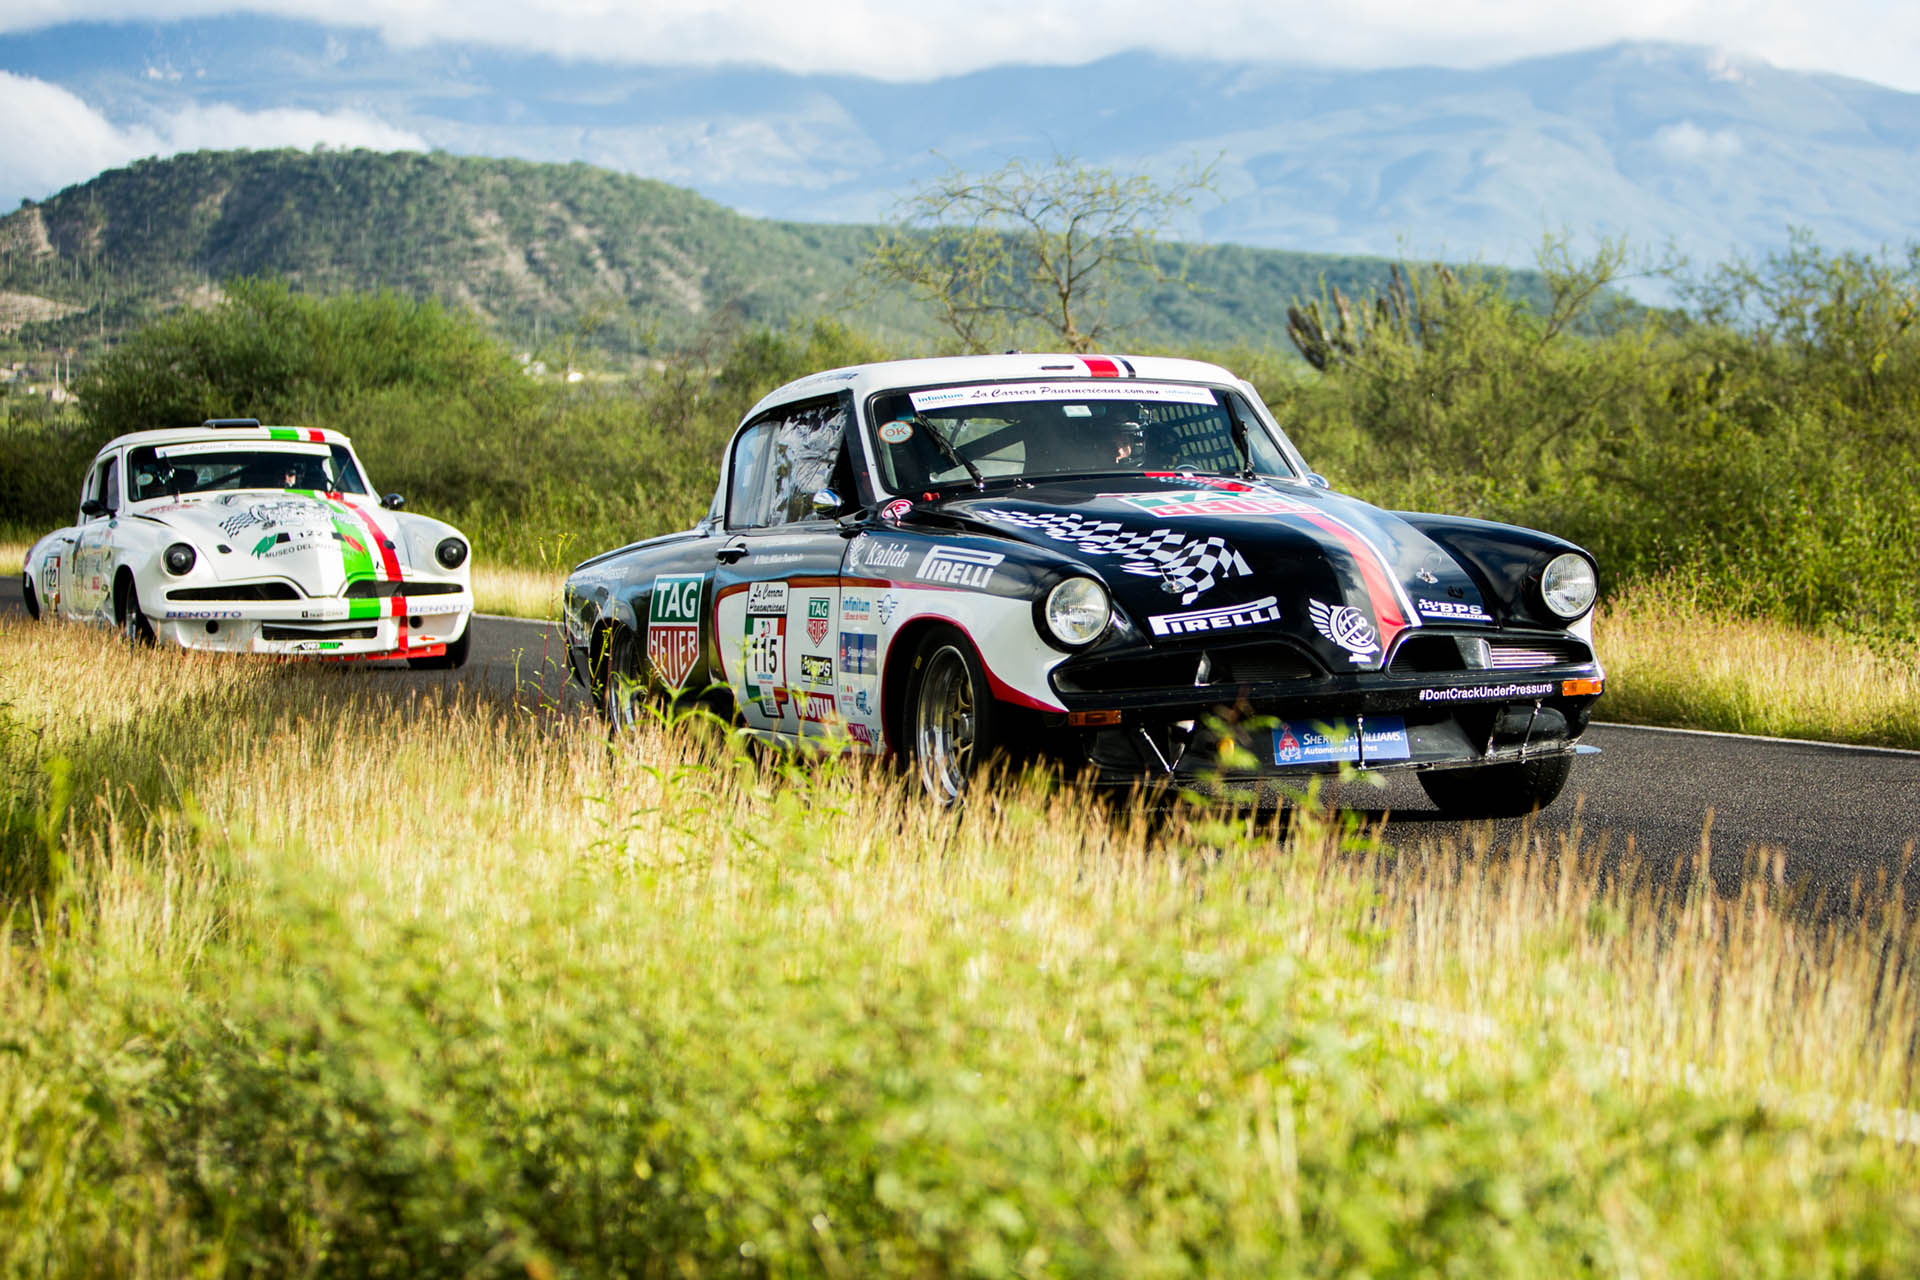 TAG Heuer unterstützt die Carrera Panamericana Mexico